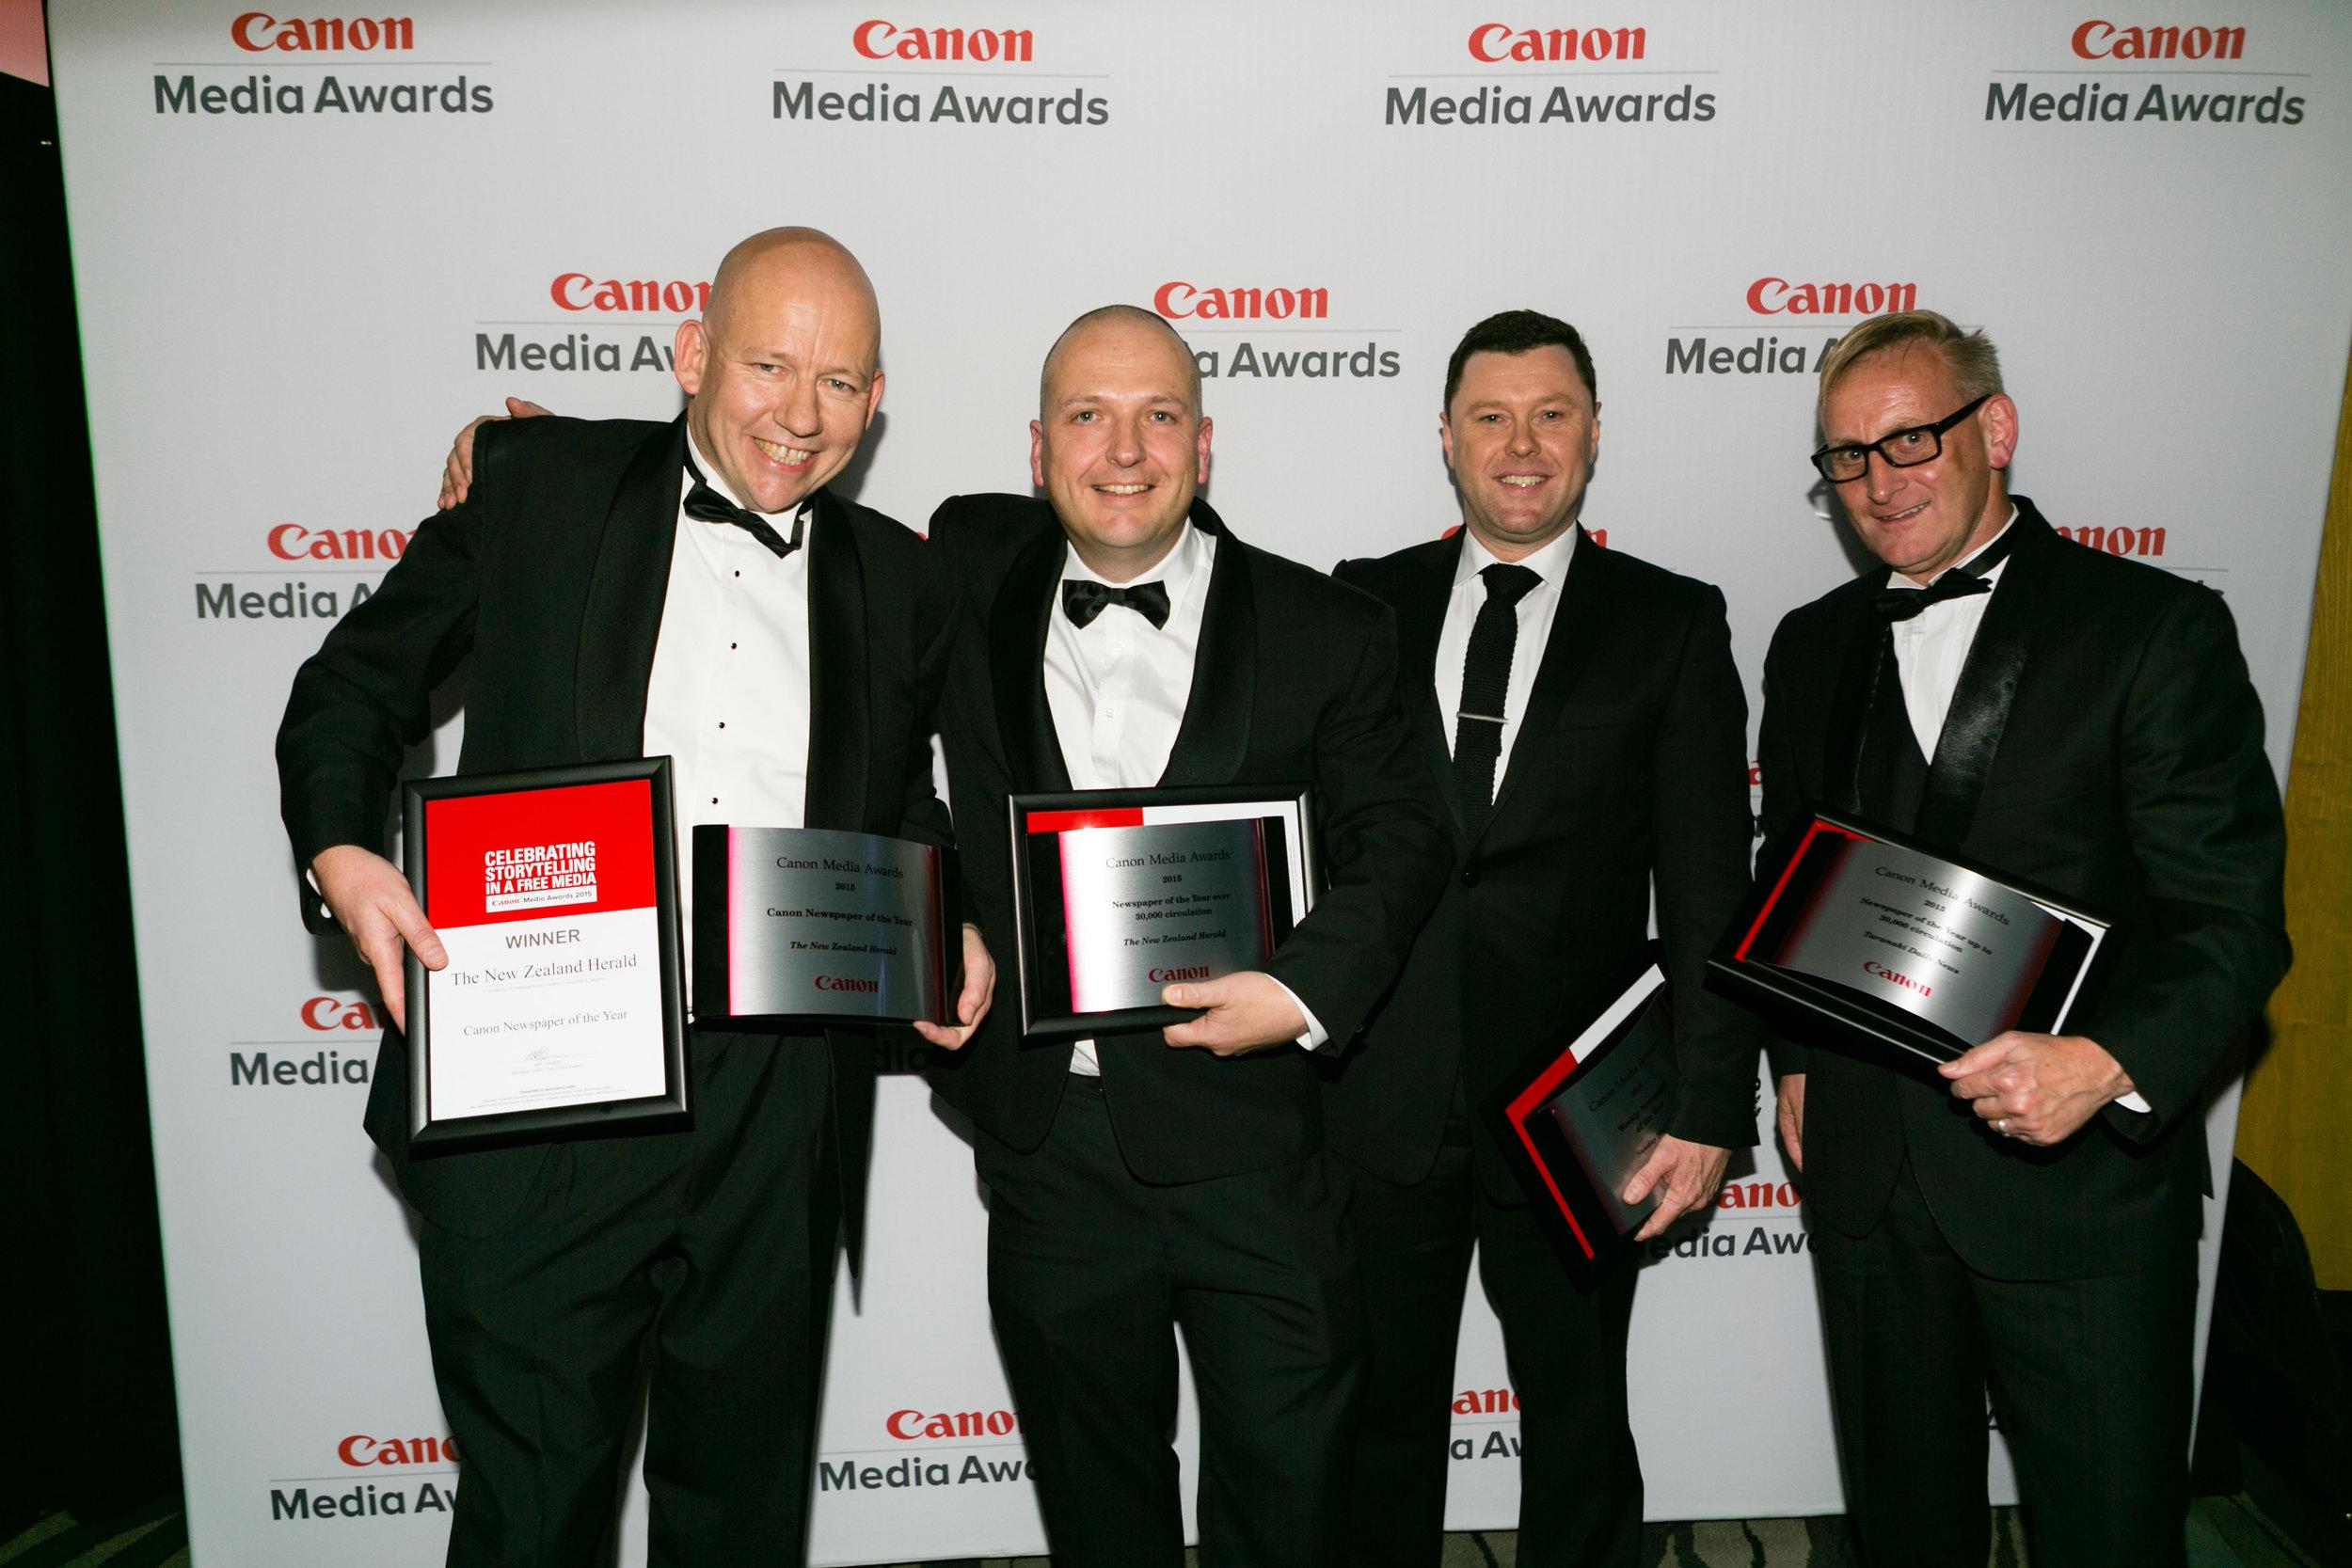 canon_media_awards_2015_interlike_nz_clinton_tudor-6037-228.jpg